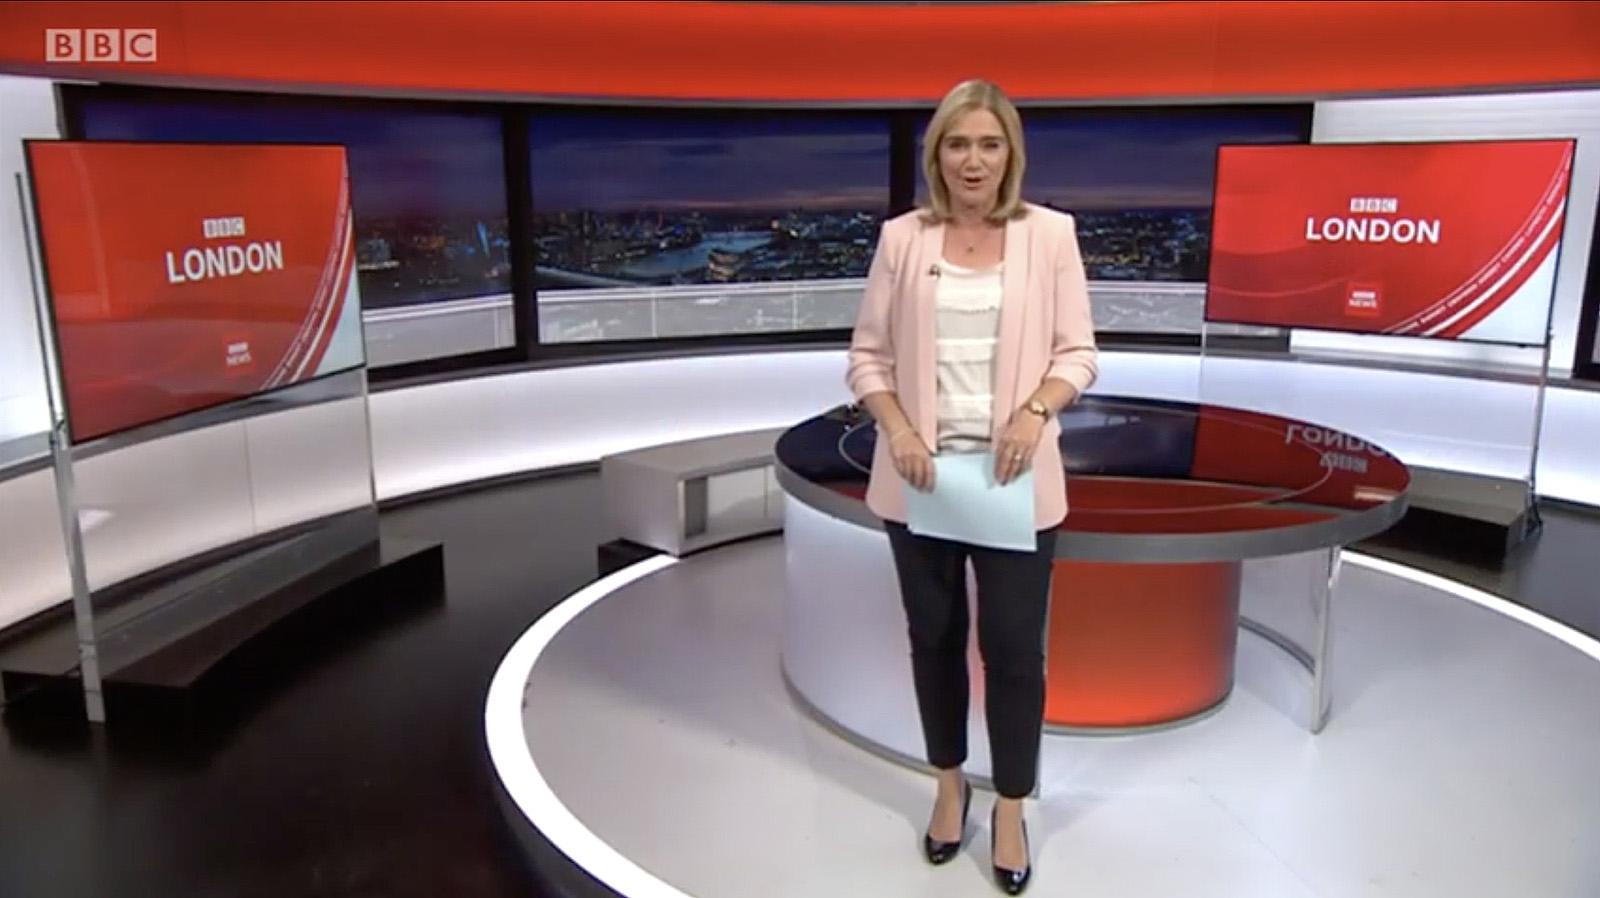 NCS_BBC-Rebrand-Reith-2019_047